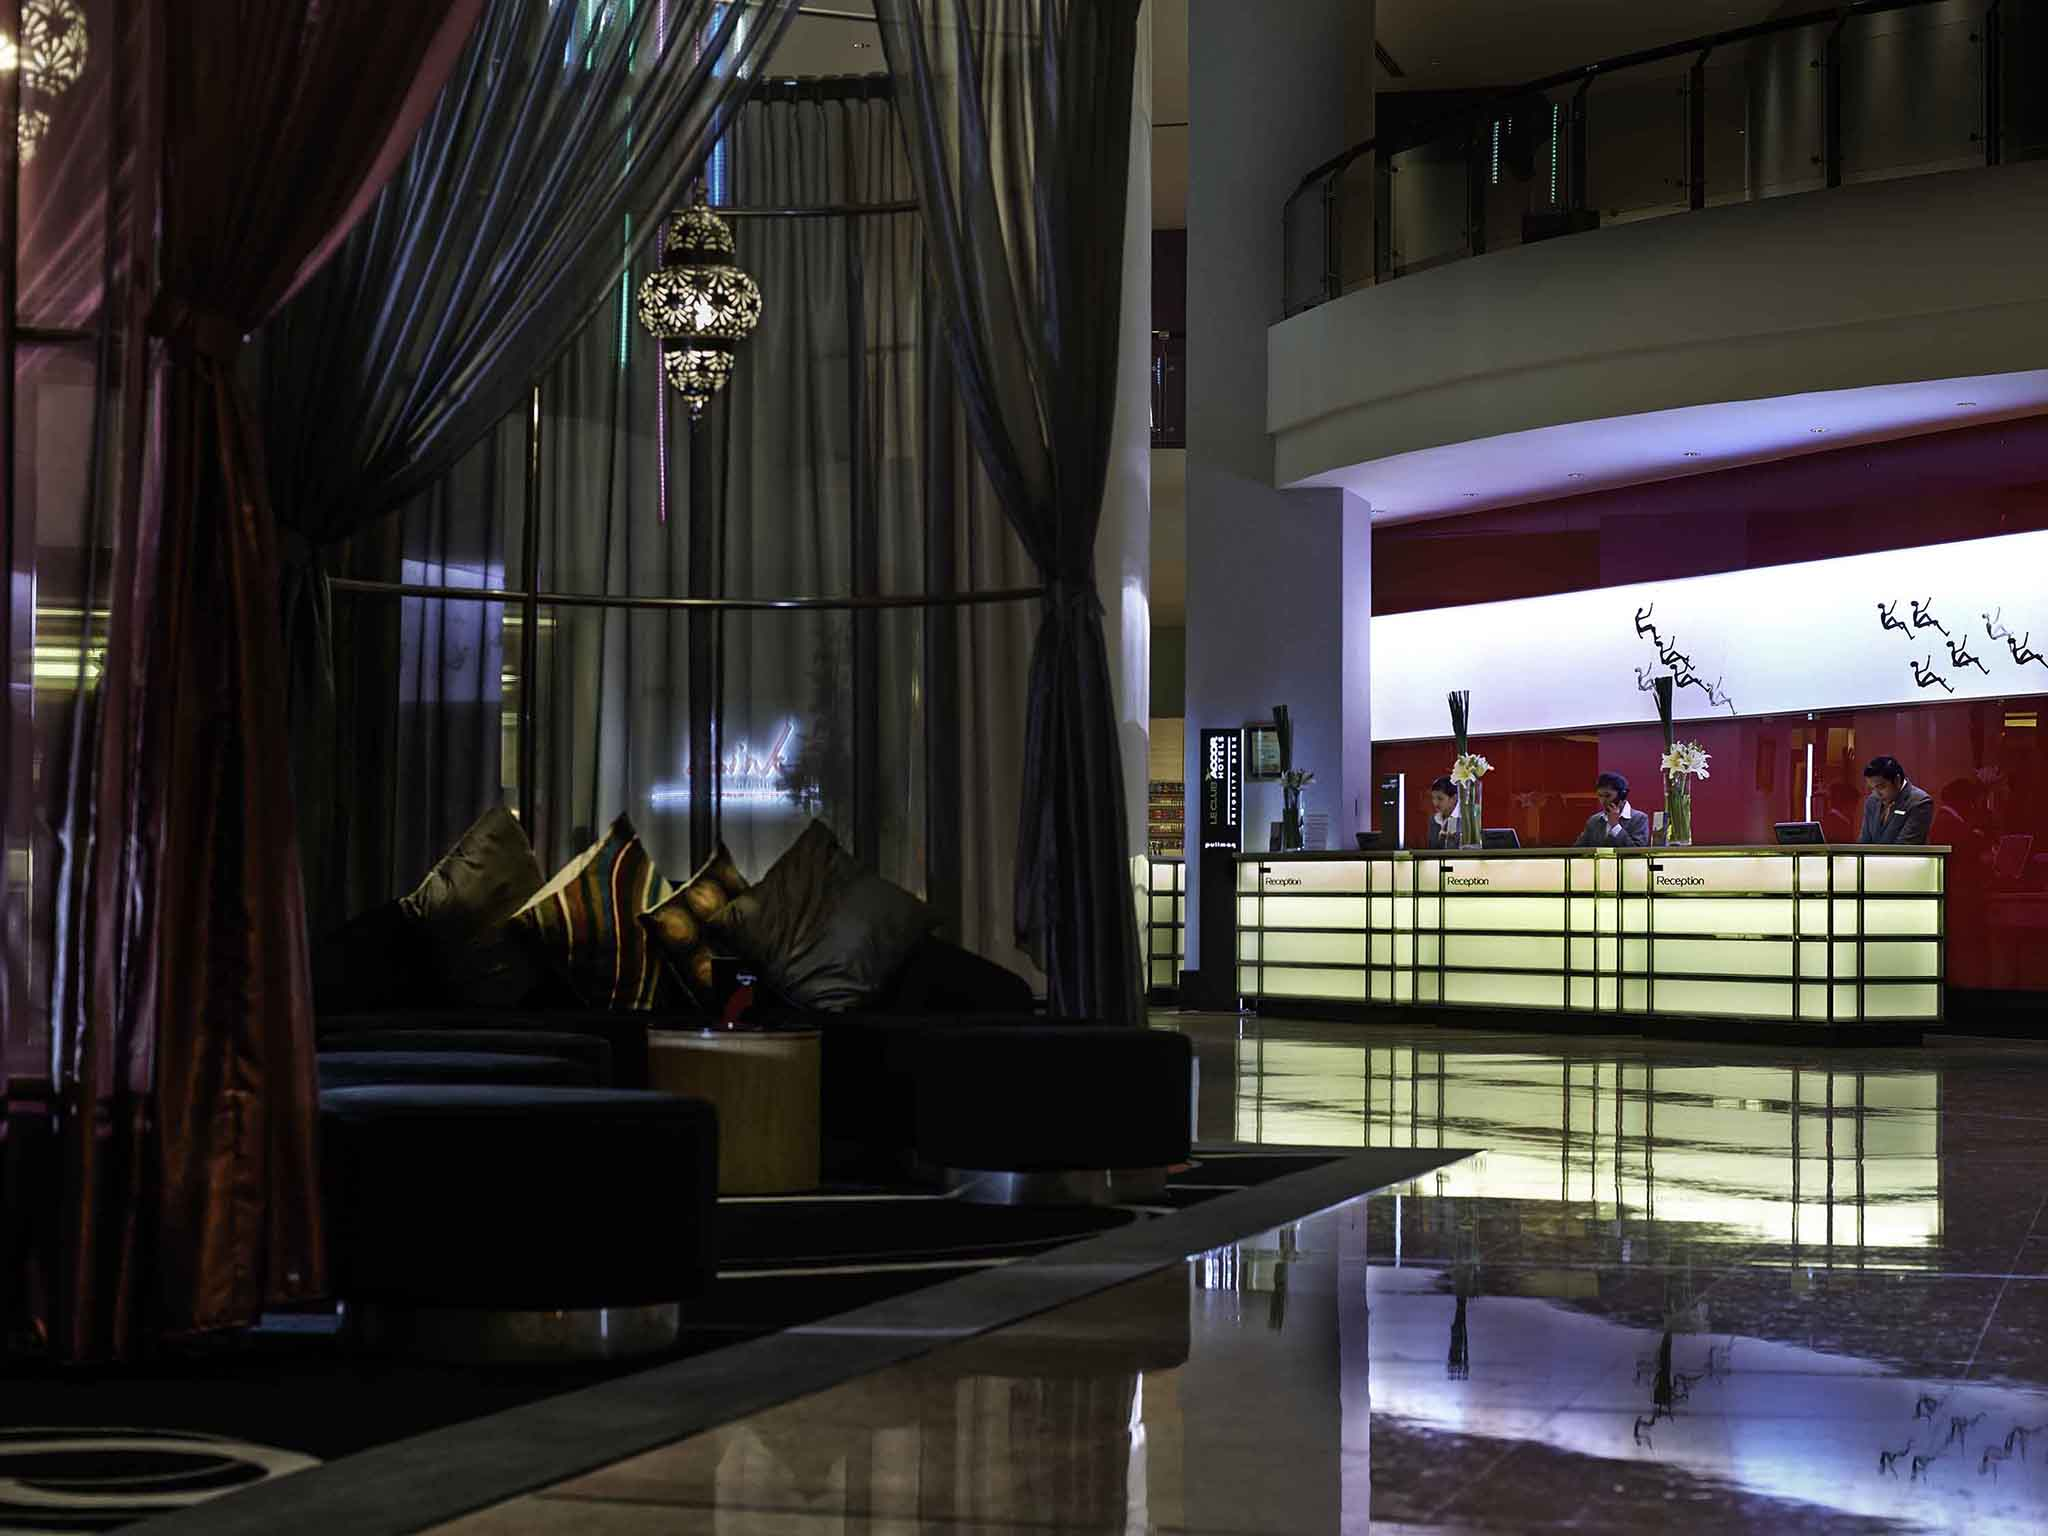 Tempat incontri Kuala Lumpur